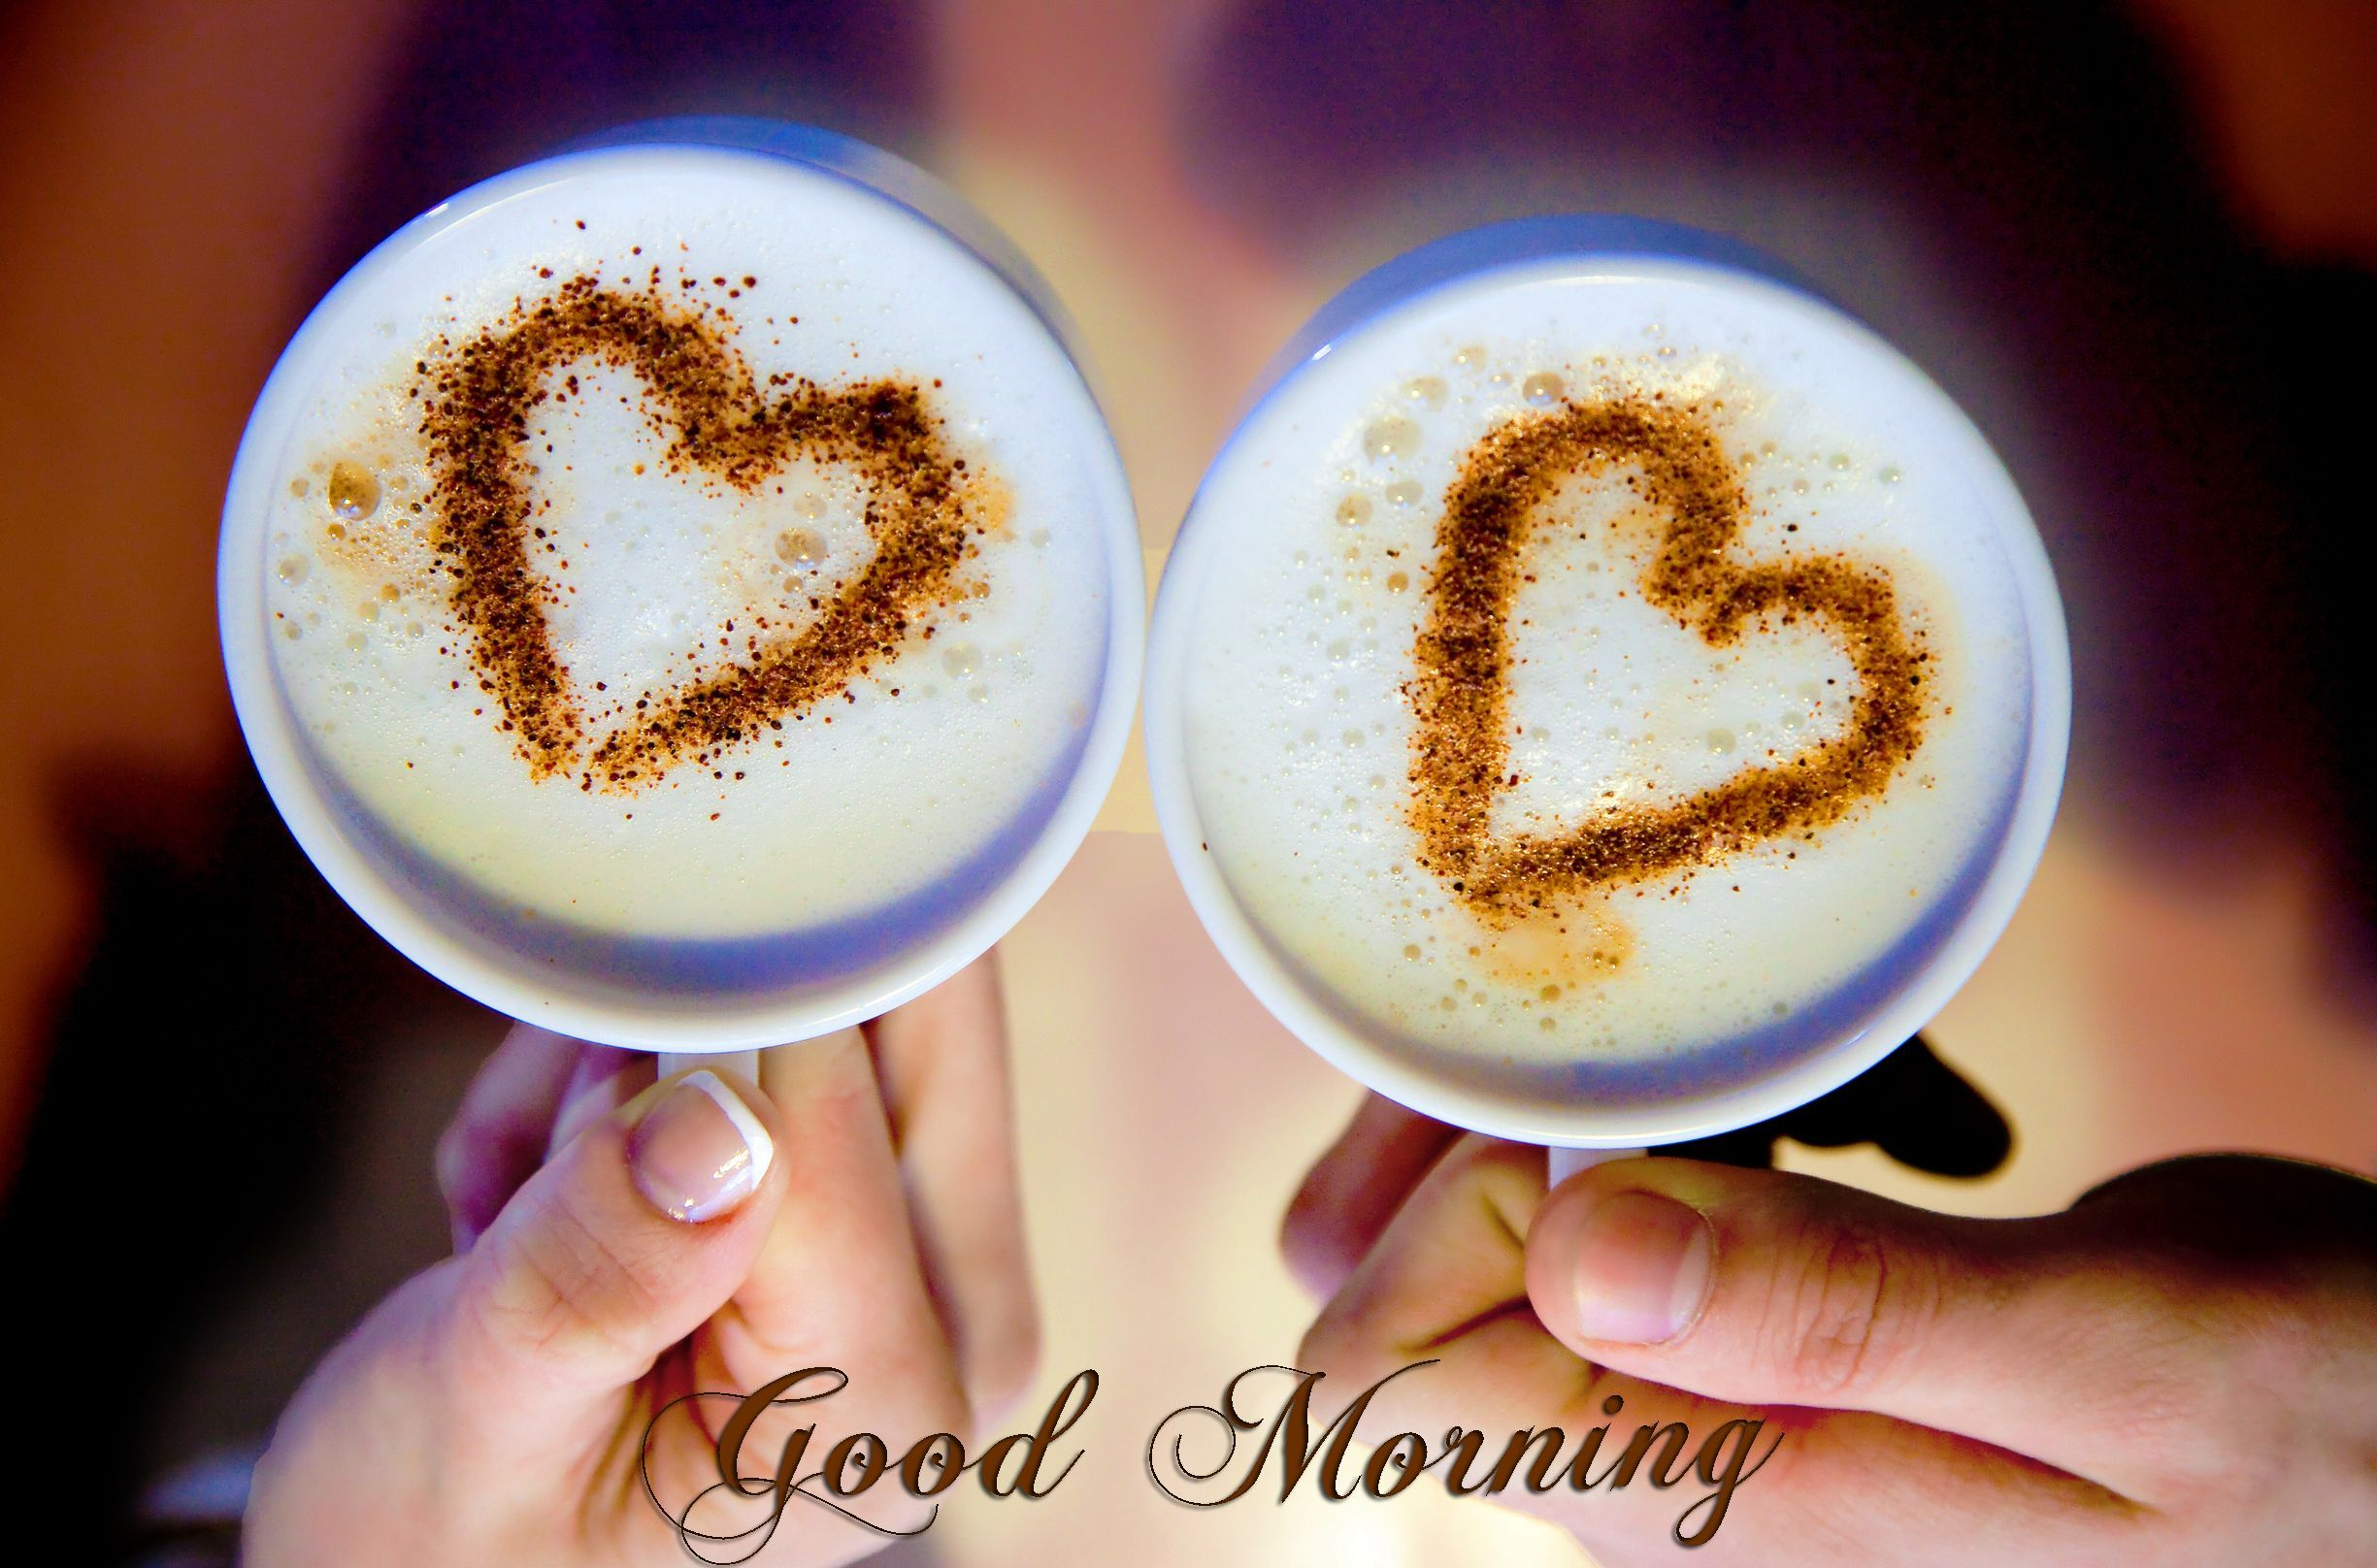 good morning hd wallpaper,heart,babycino,food,cappuccino,latte